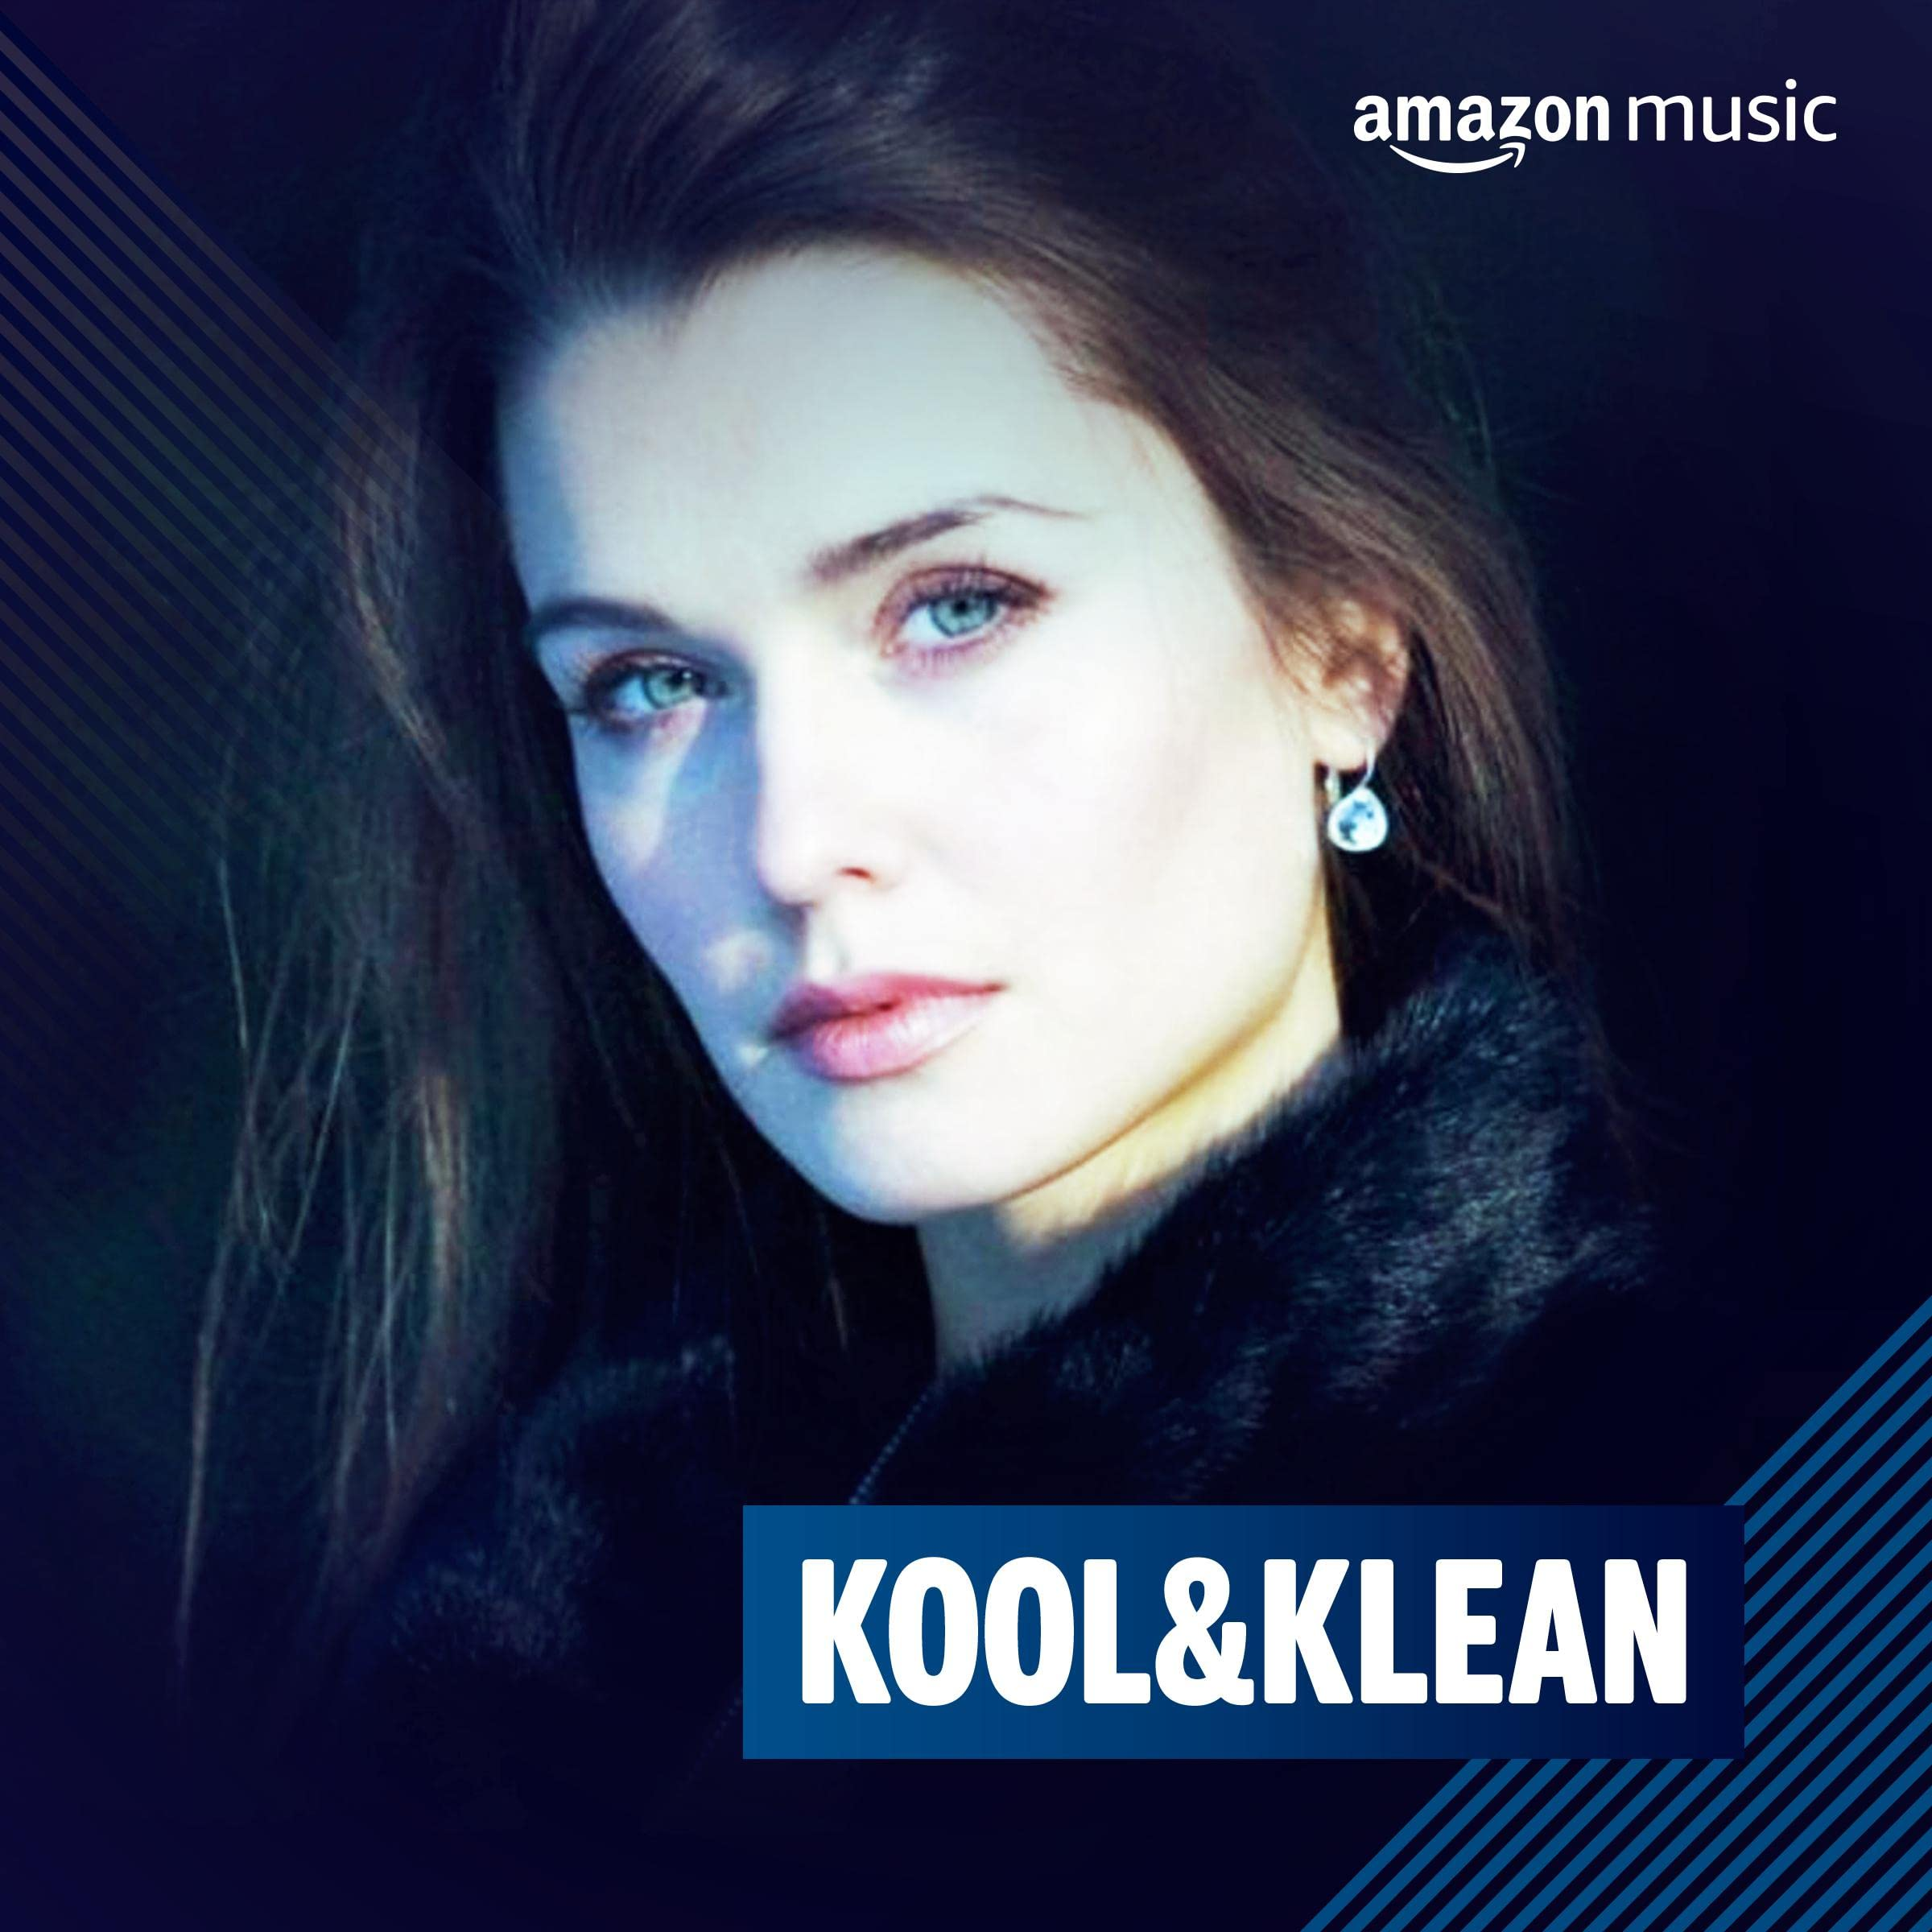 Kool&Klean